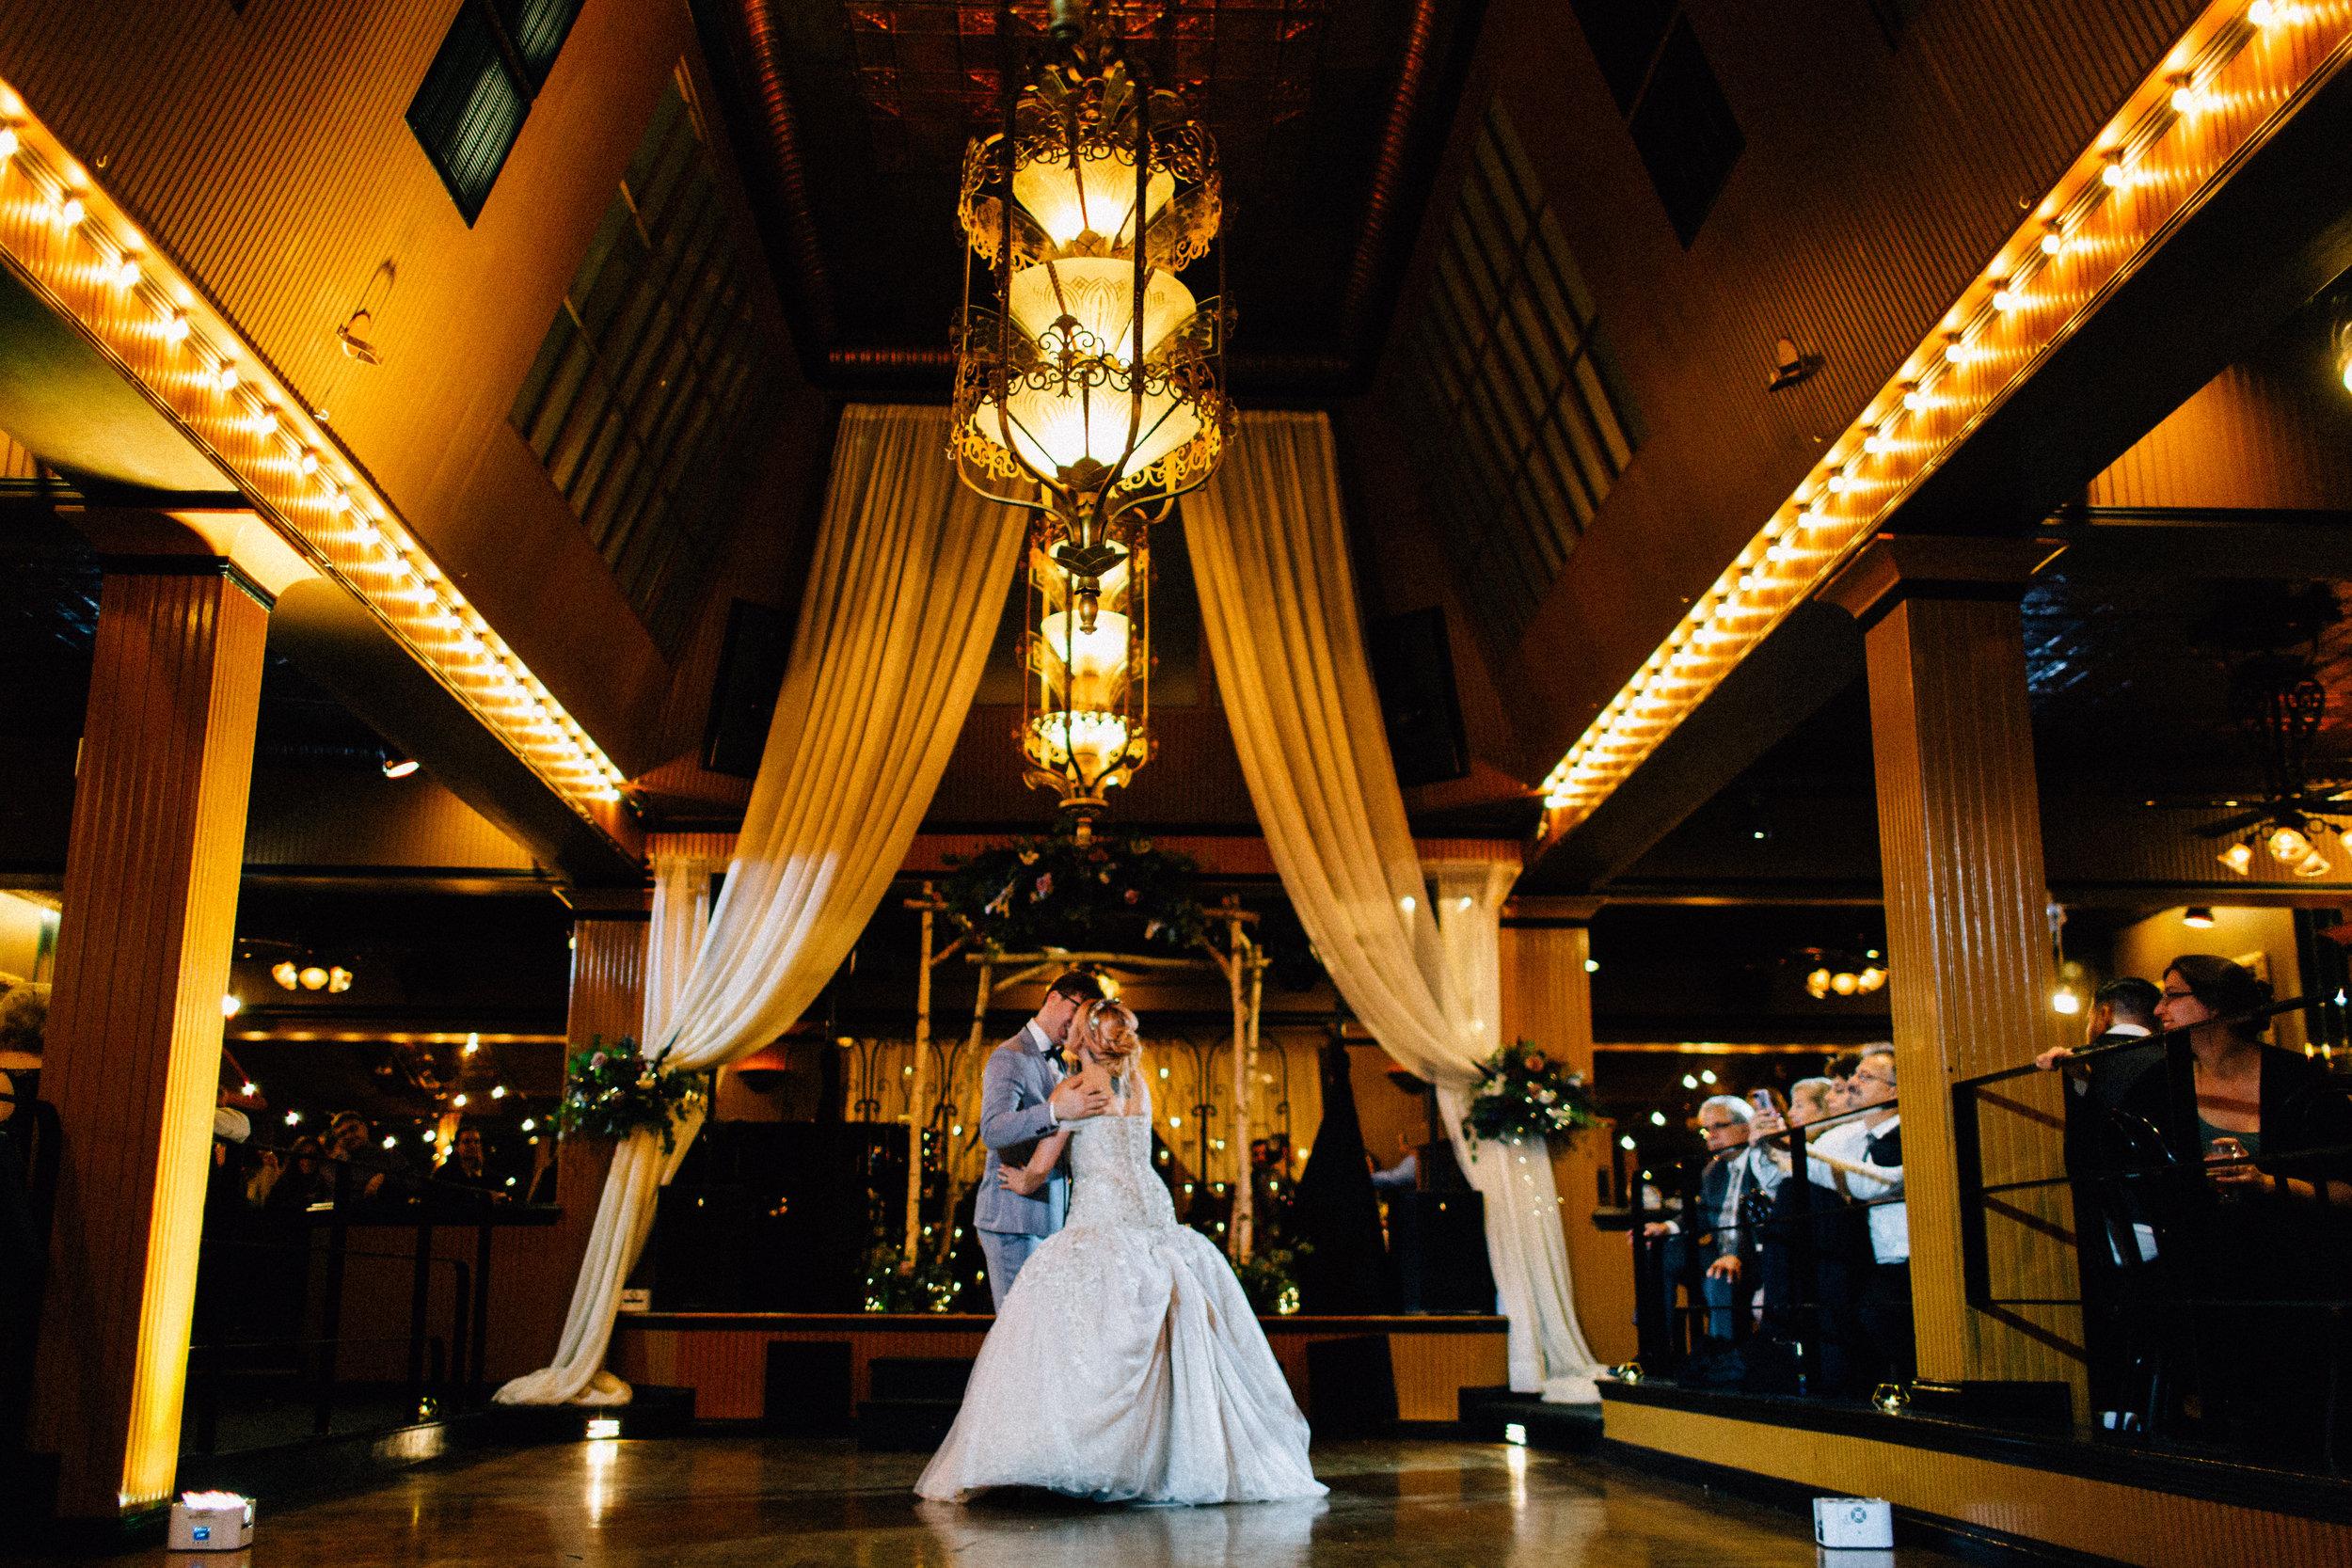 Abram-Jenn-Lake-Union-Cafe-Wedding-8106.jpg